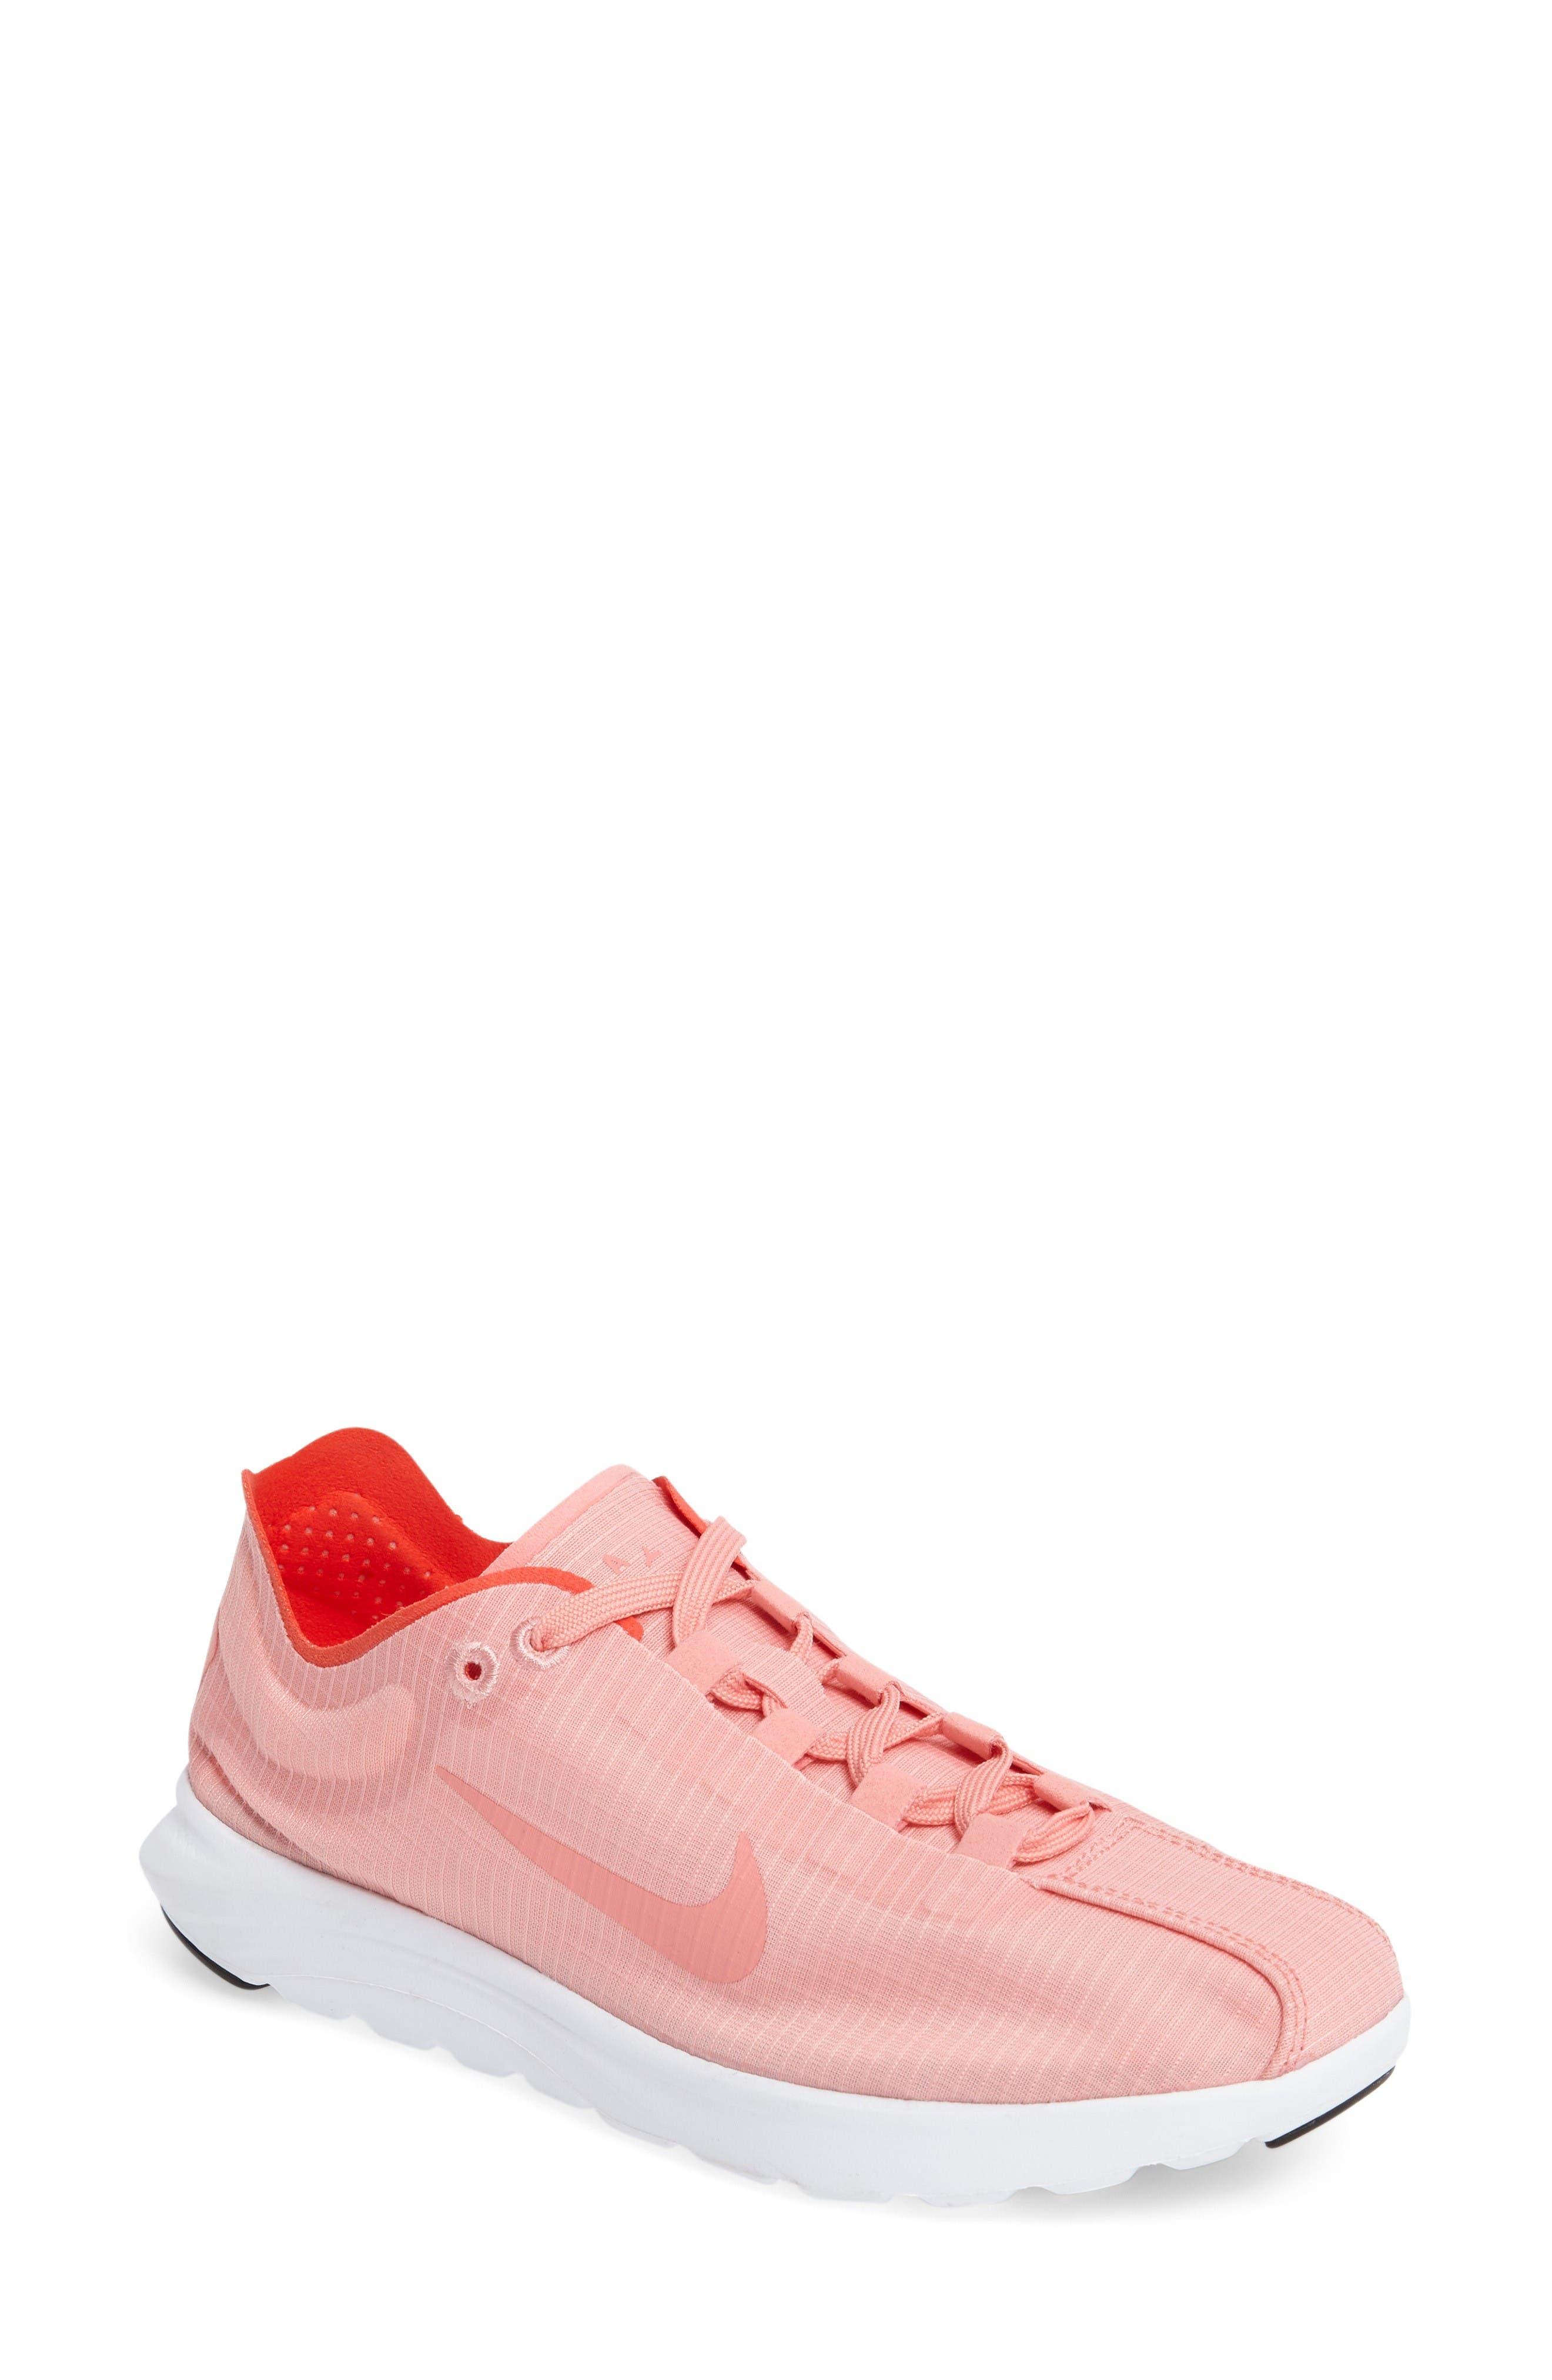 Main Image - Nike Mayfly Lite SE Sneaker (Women)